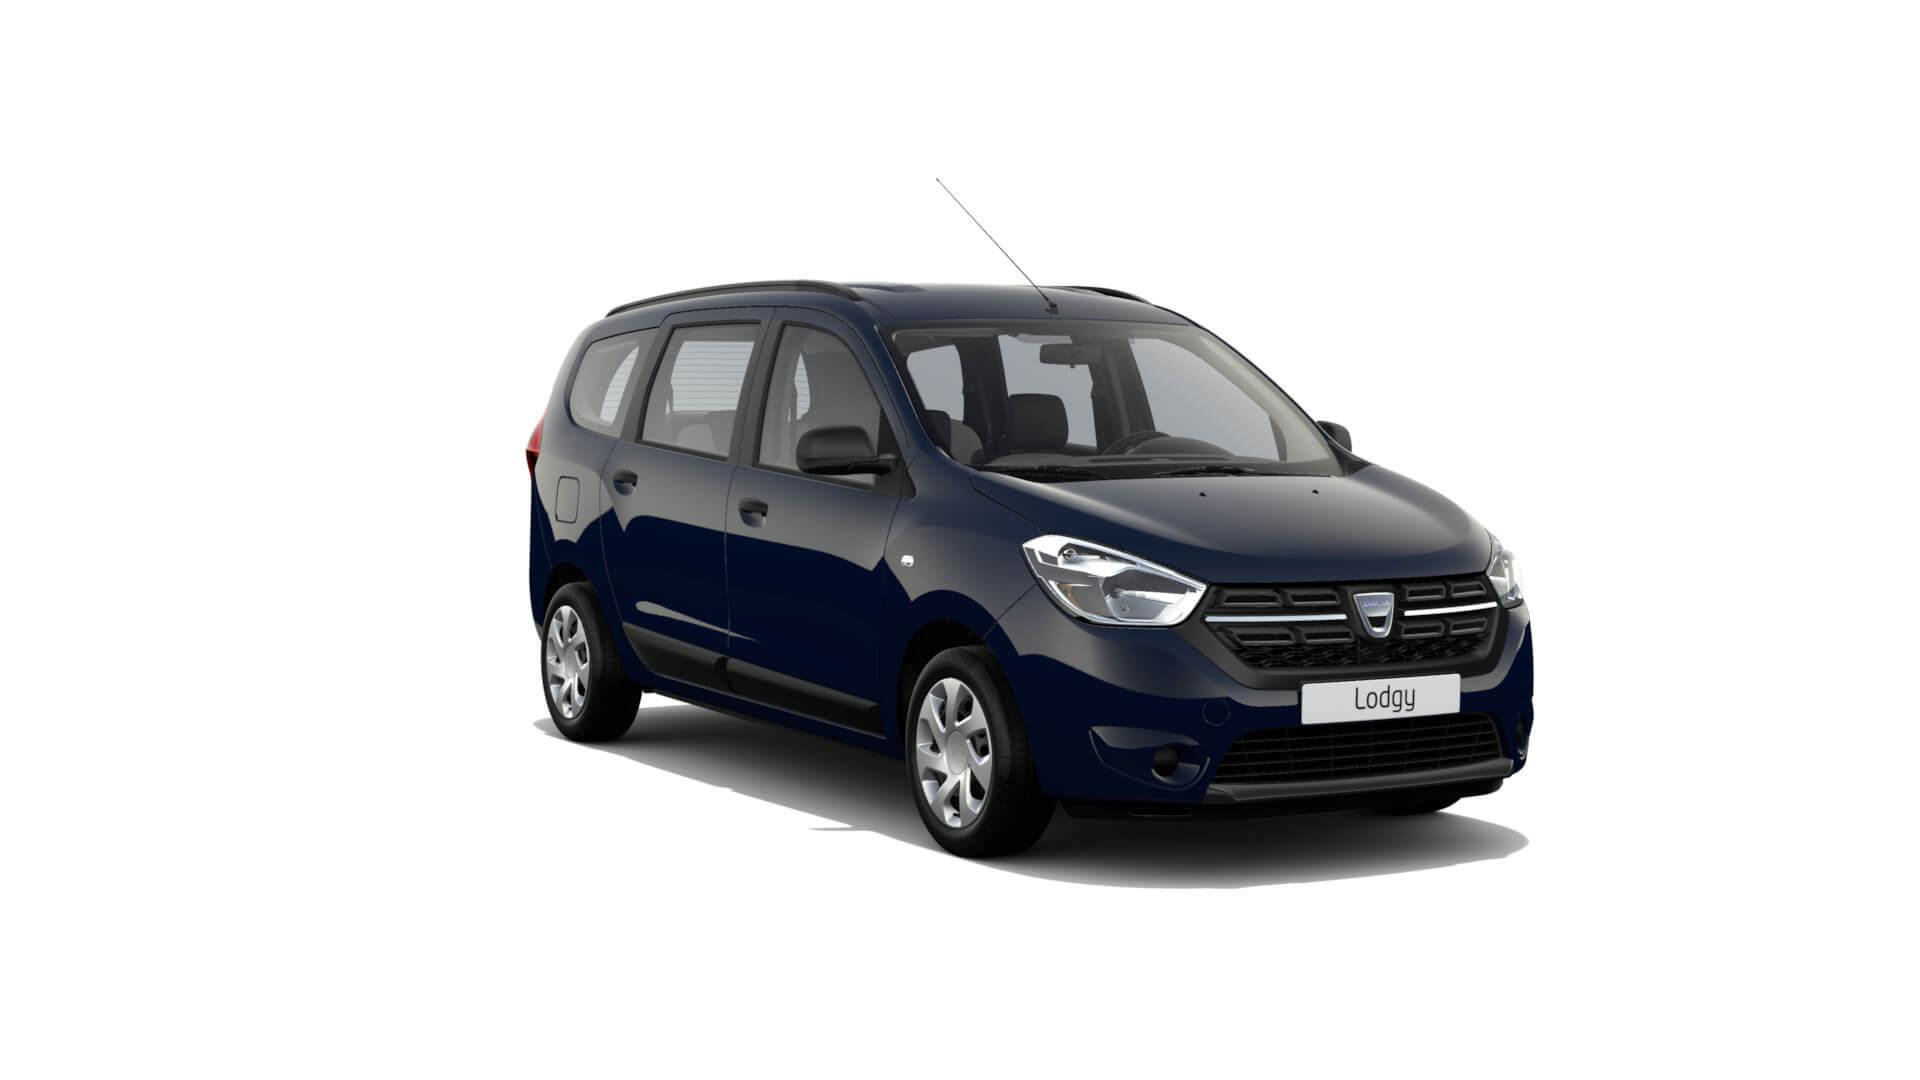 Automodell blau - Dacia Lodgy - Renault Ahrens Hannover